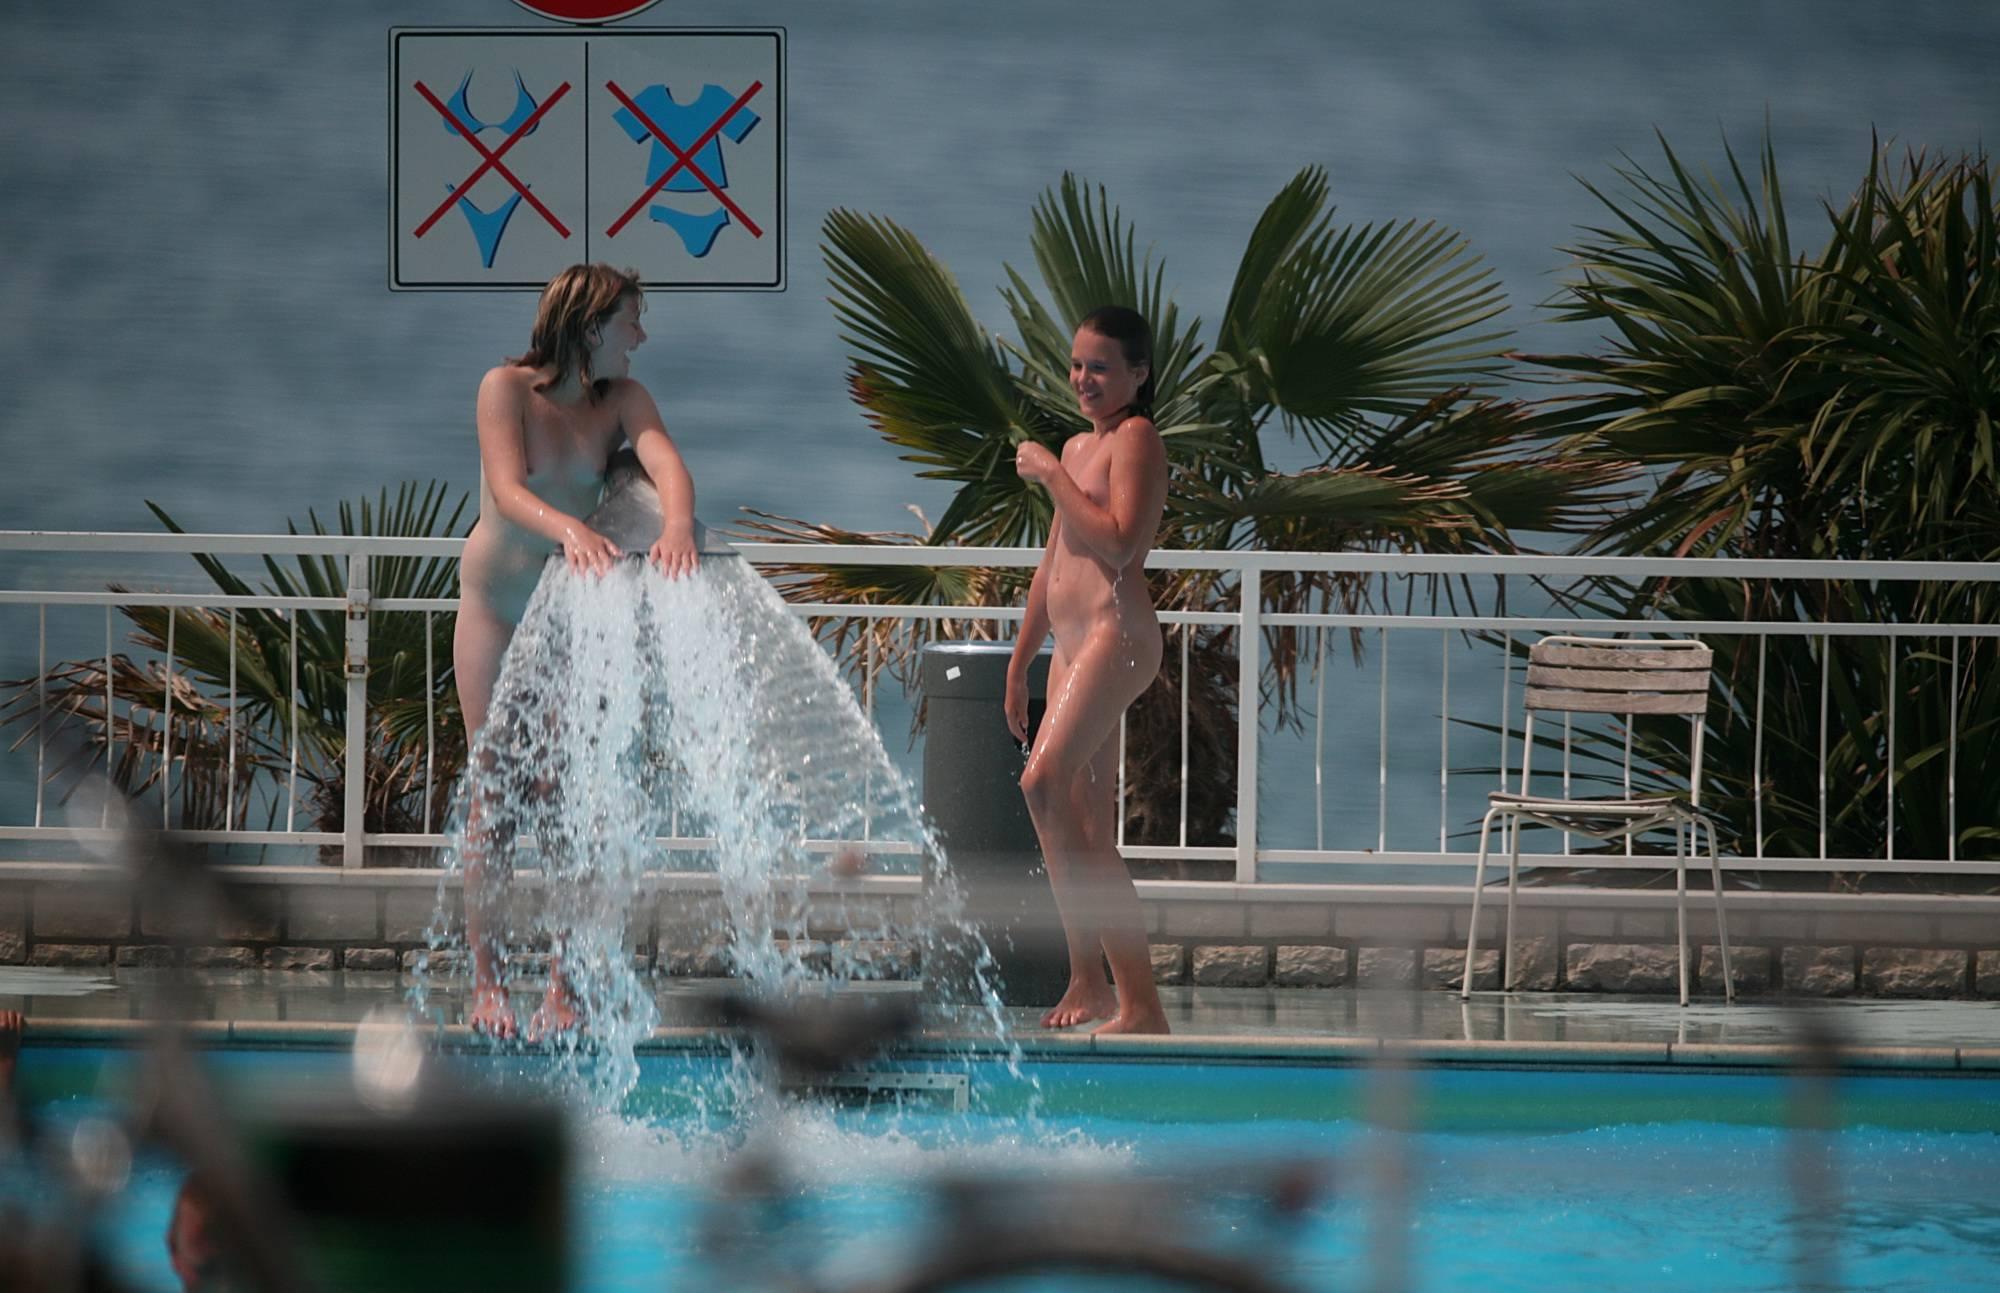 Pure Nudism Pics-Nude Pool Sprinkler Play - 1